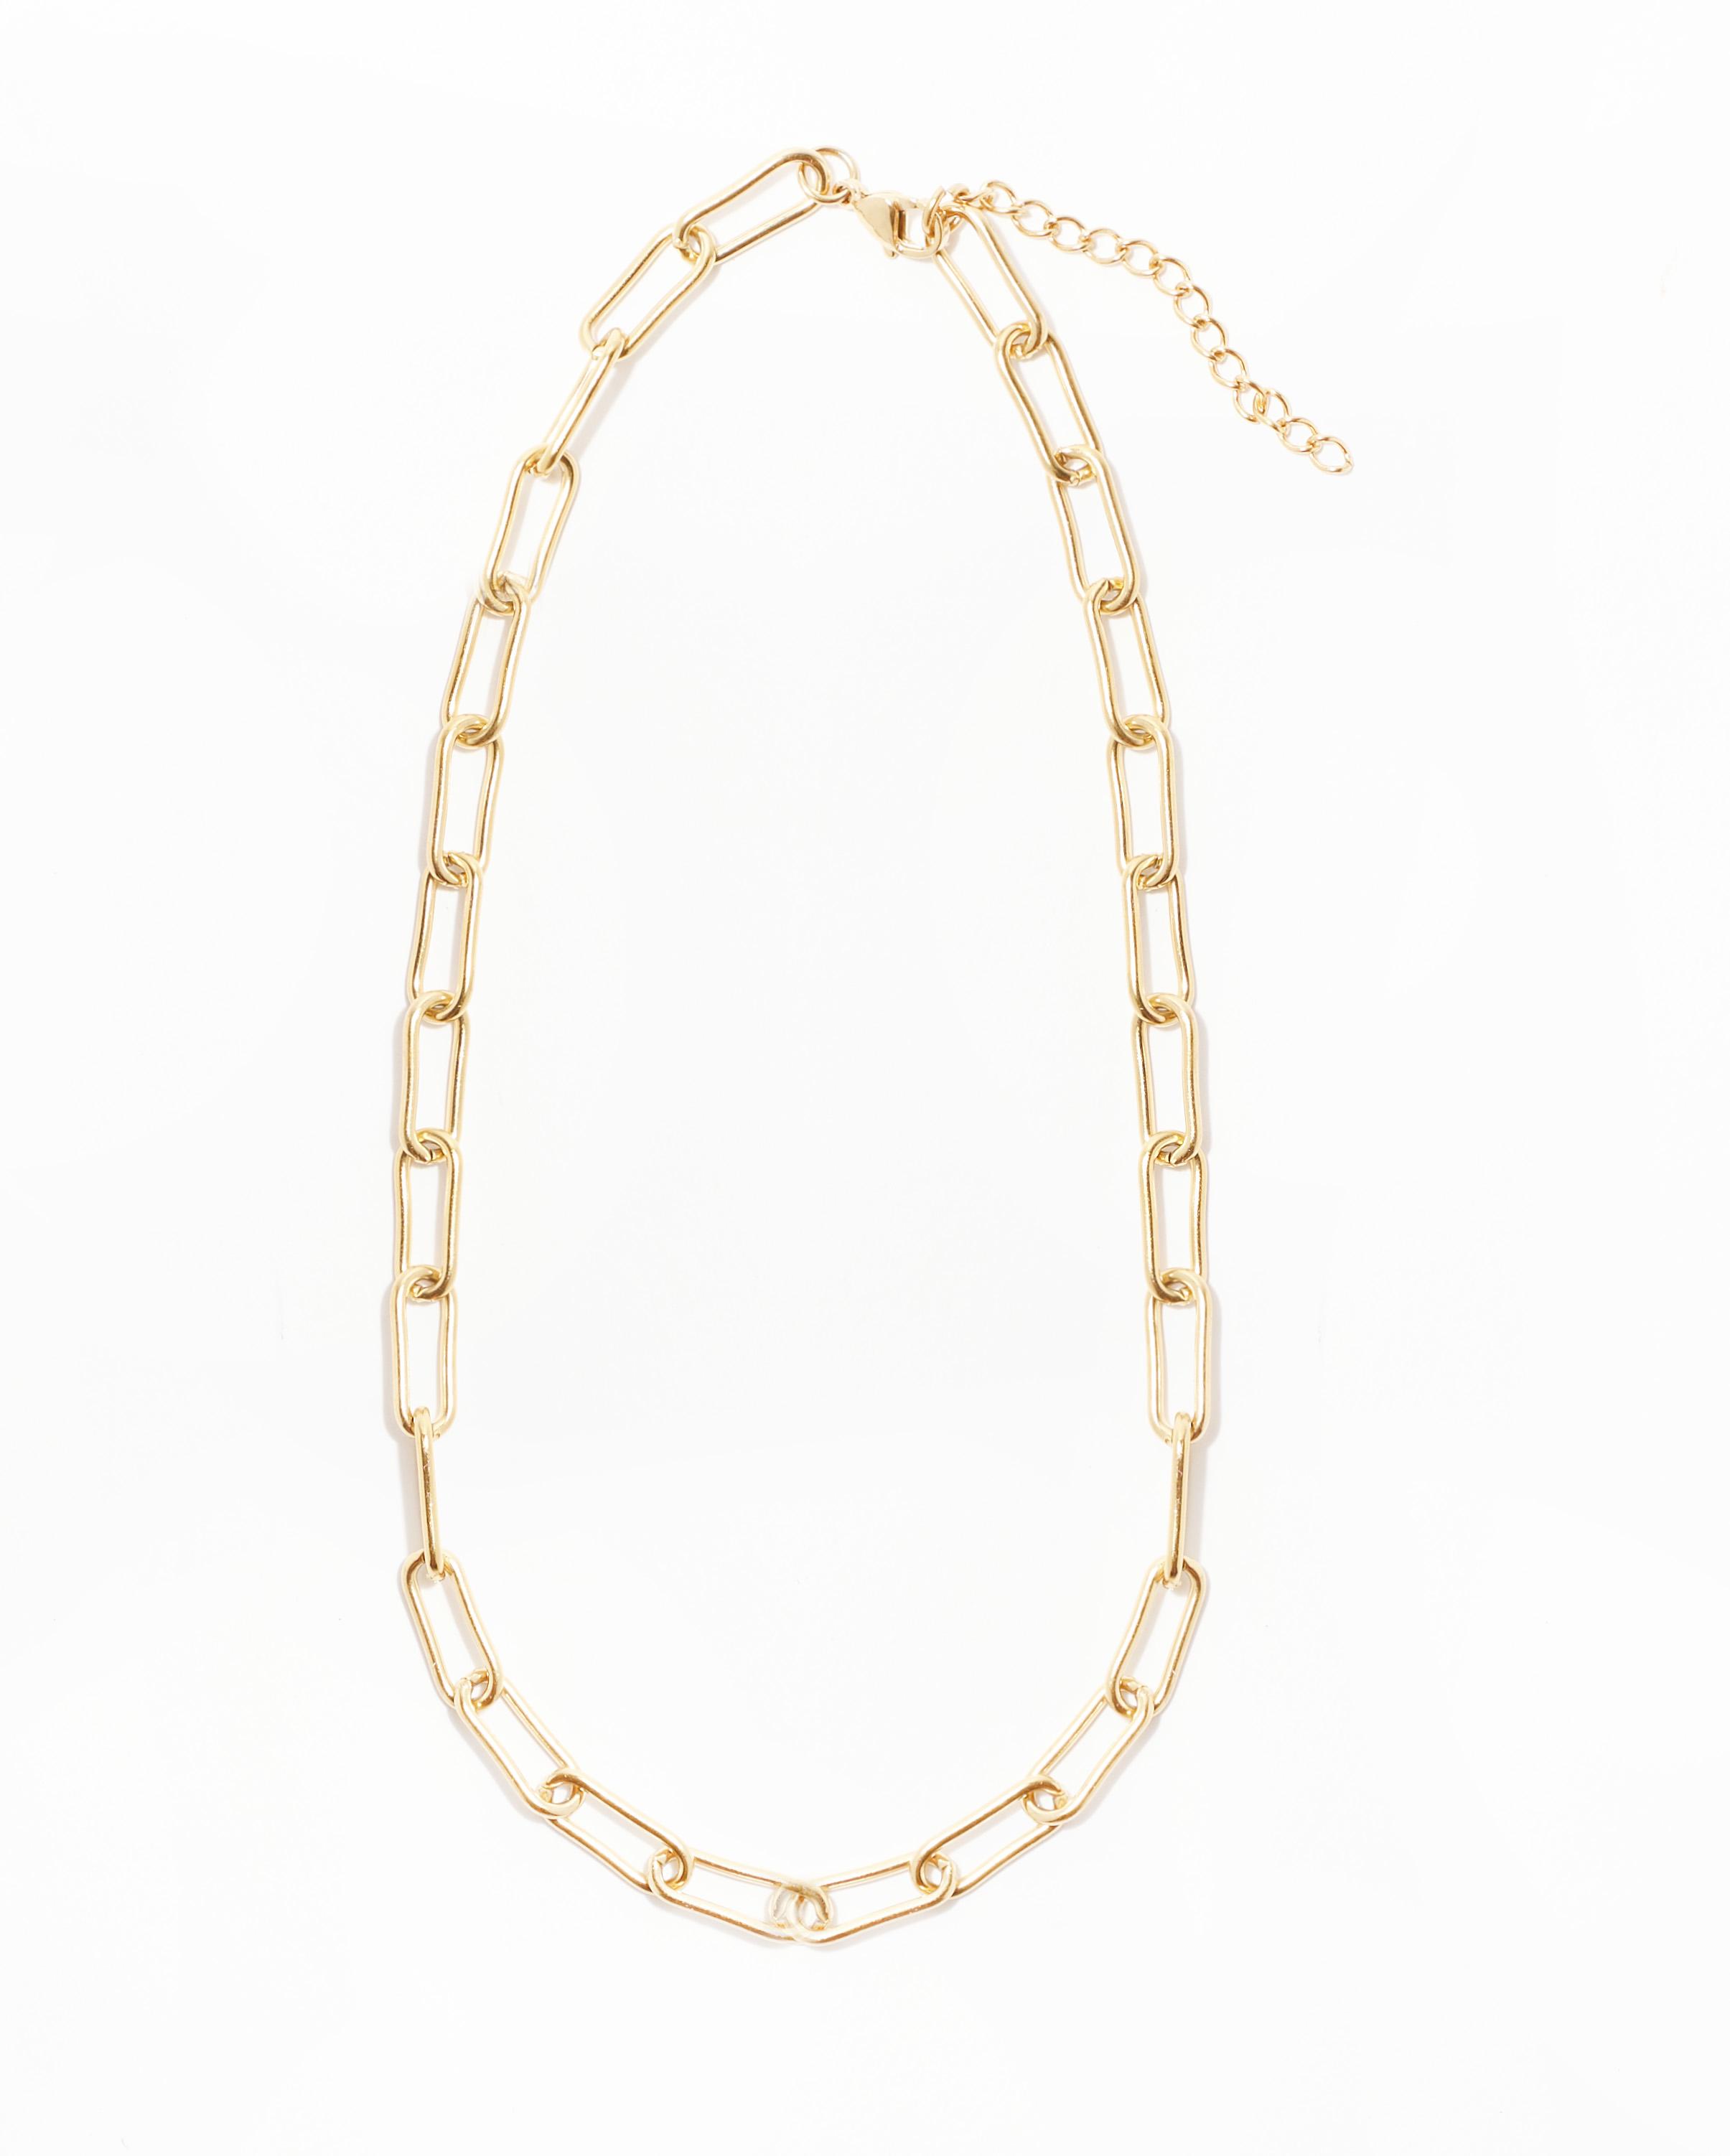 Bijoux Femme - Collier Or Jina - Nl91198